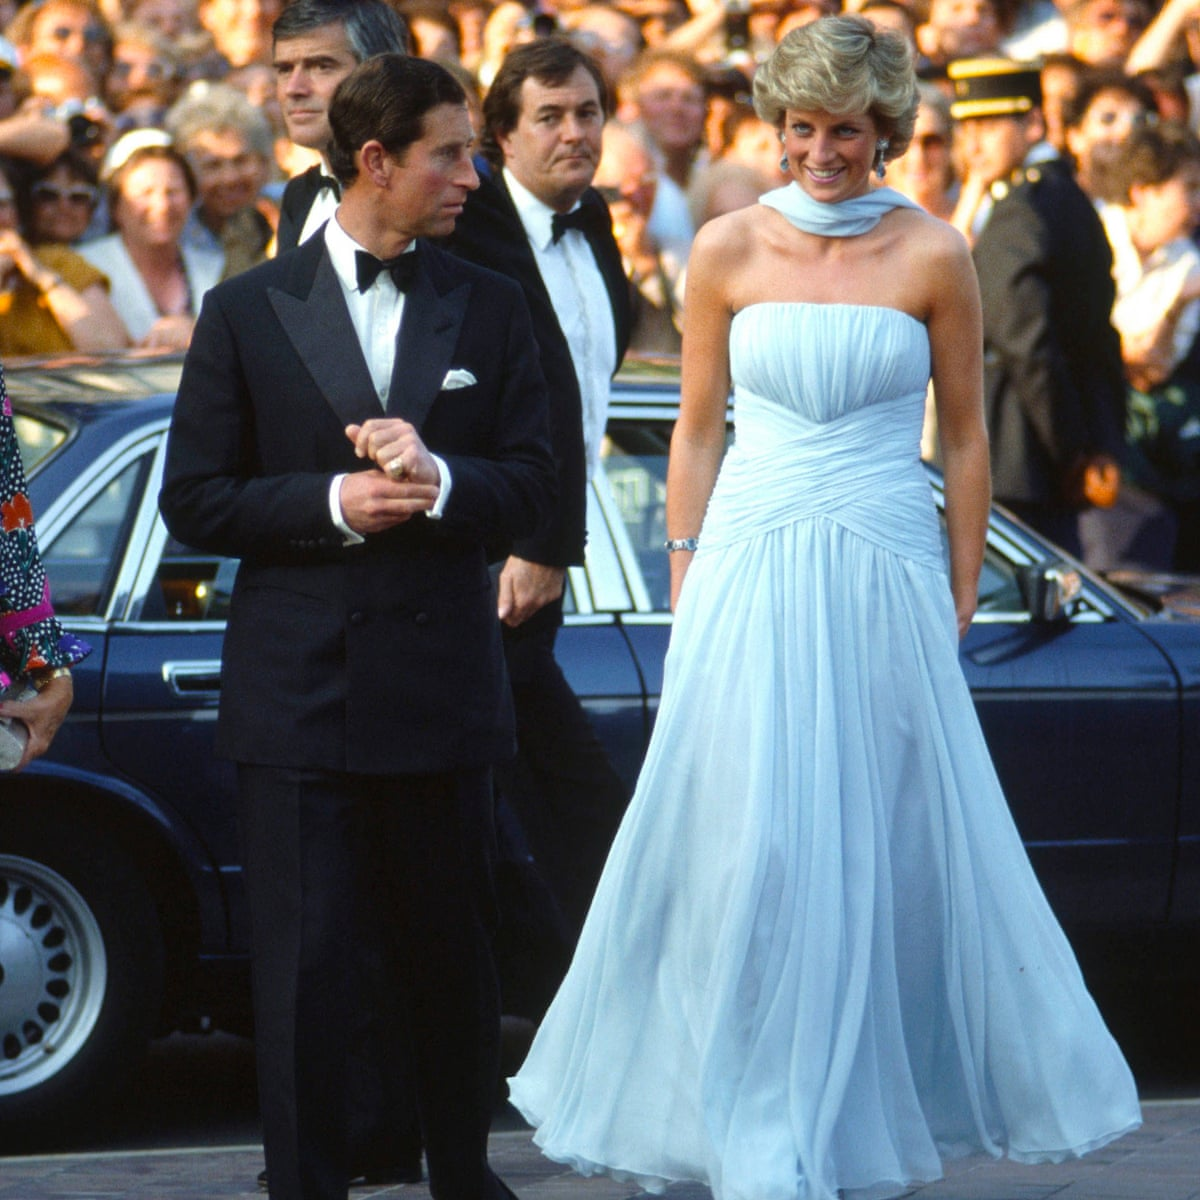 Princess Diana S Fashion Legacy To Be Celebrated At Kensington Palace Uk News The Guardian